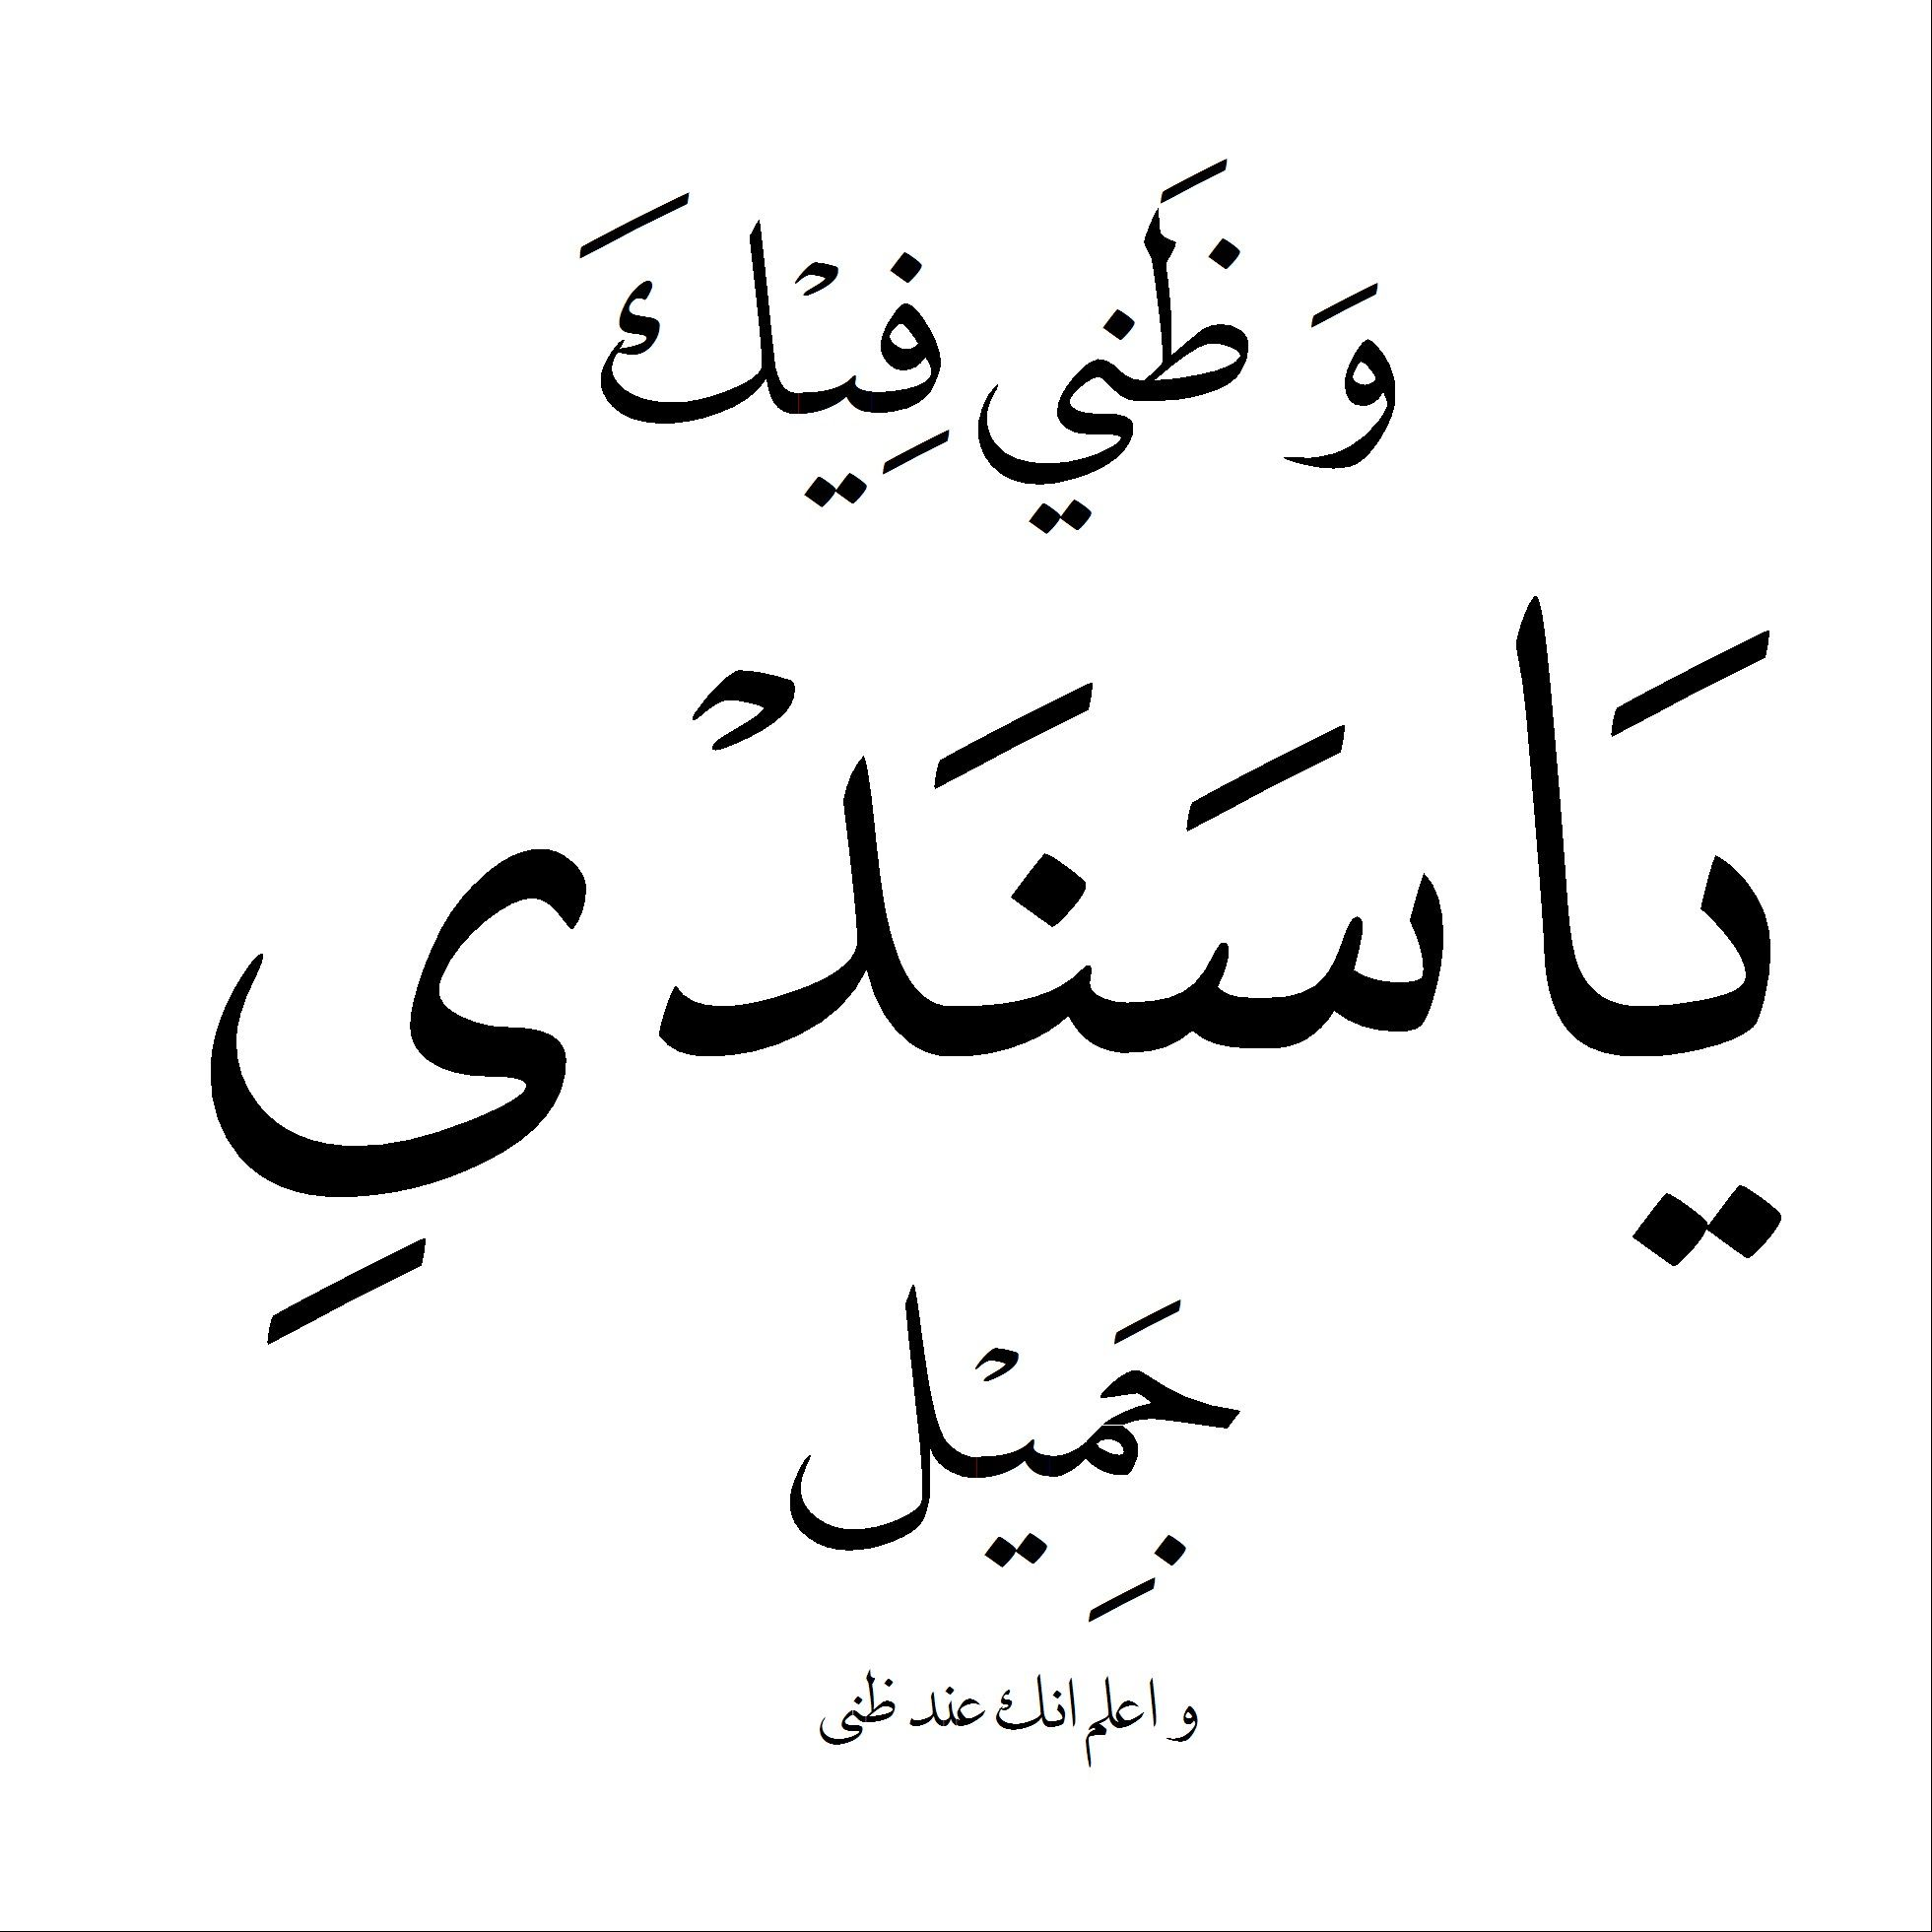 و ظنى فيك يا سندى جميل و اعلم انك عند ظنى Islamic Quotes Beautiful Arabic Words Words